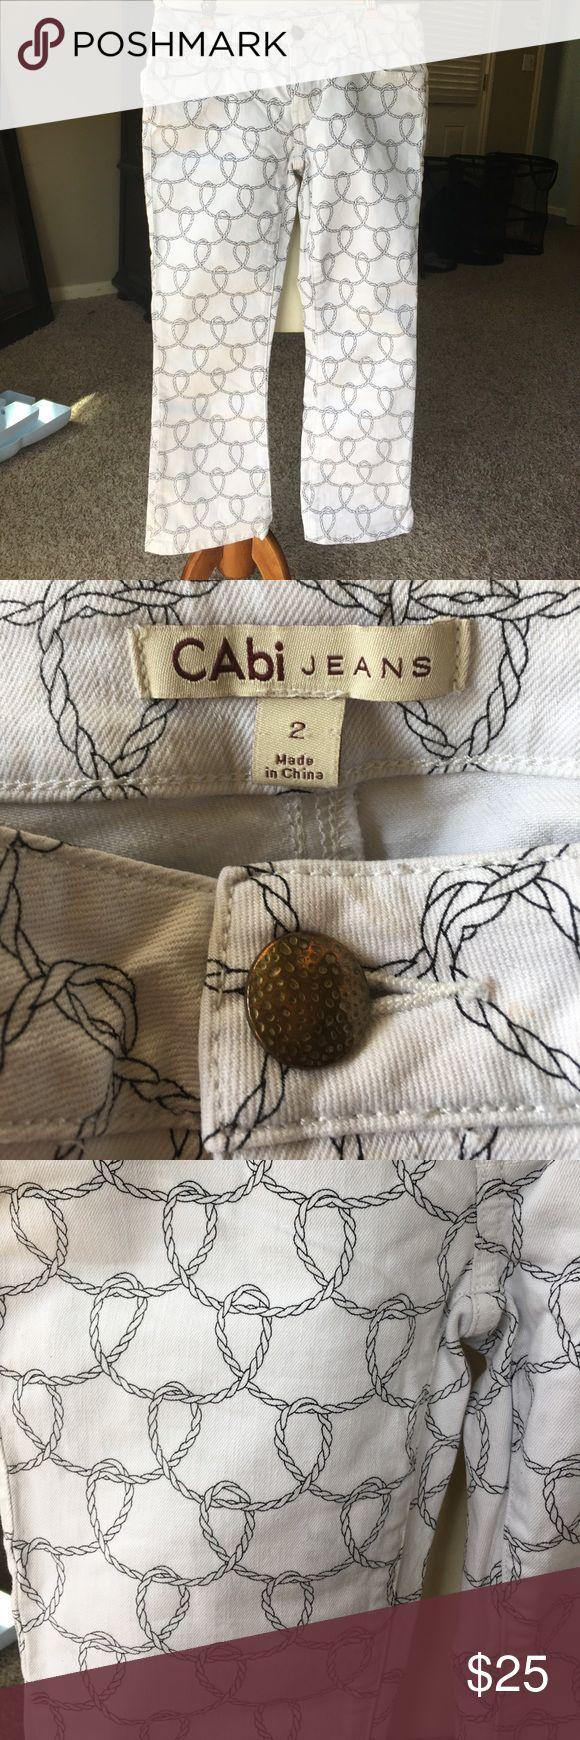 Cabi white rope nautical jean capris size 2 Cabi white rope nautical jean capris size 2 #761 CAbi Jeans Ankle & Cropped